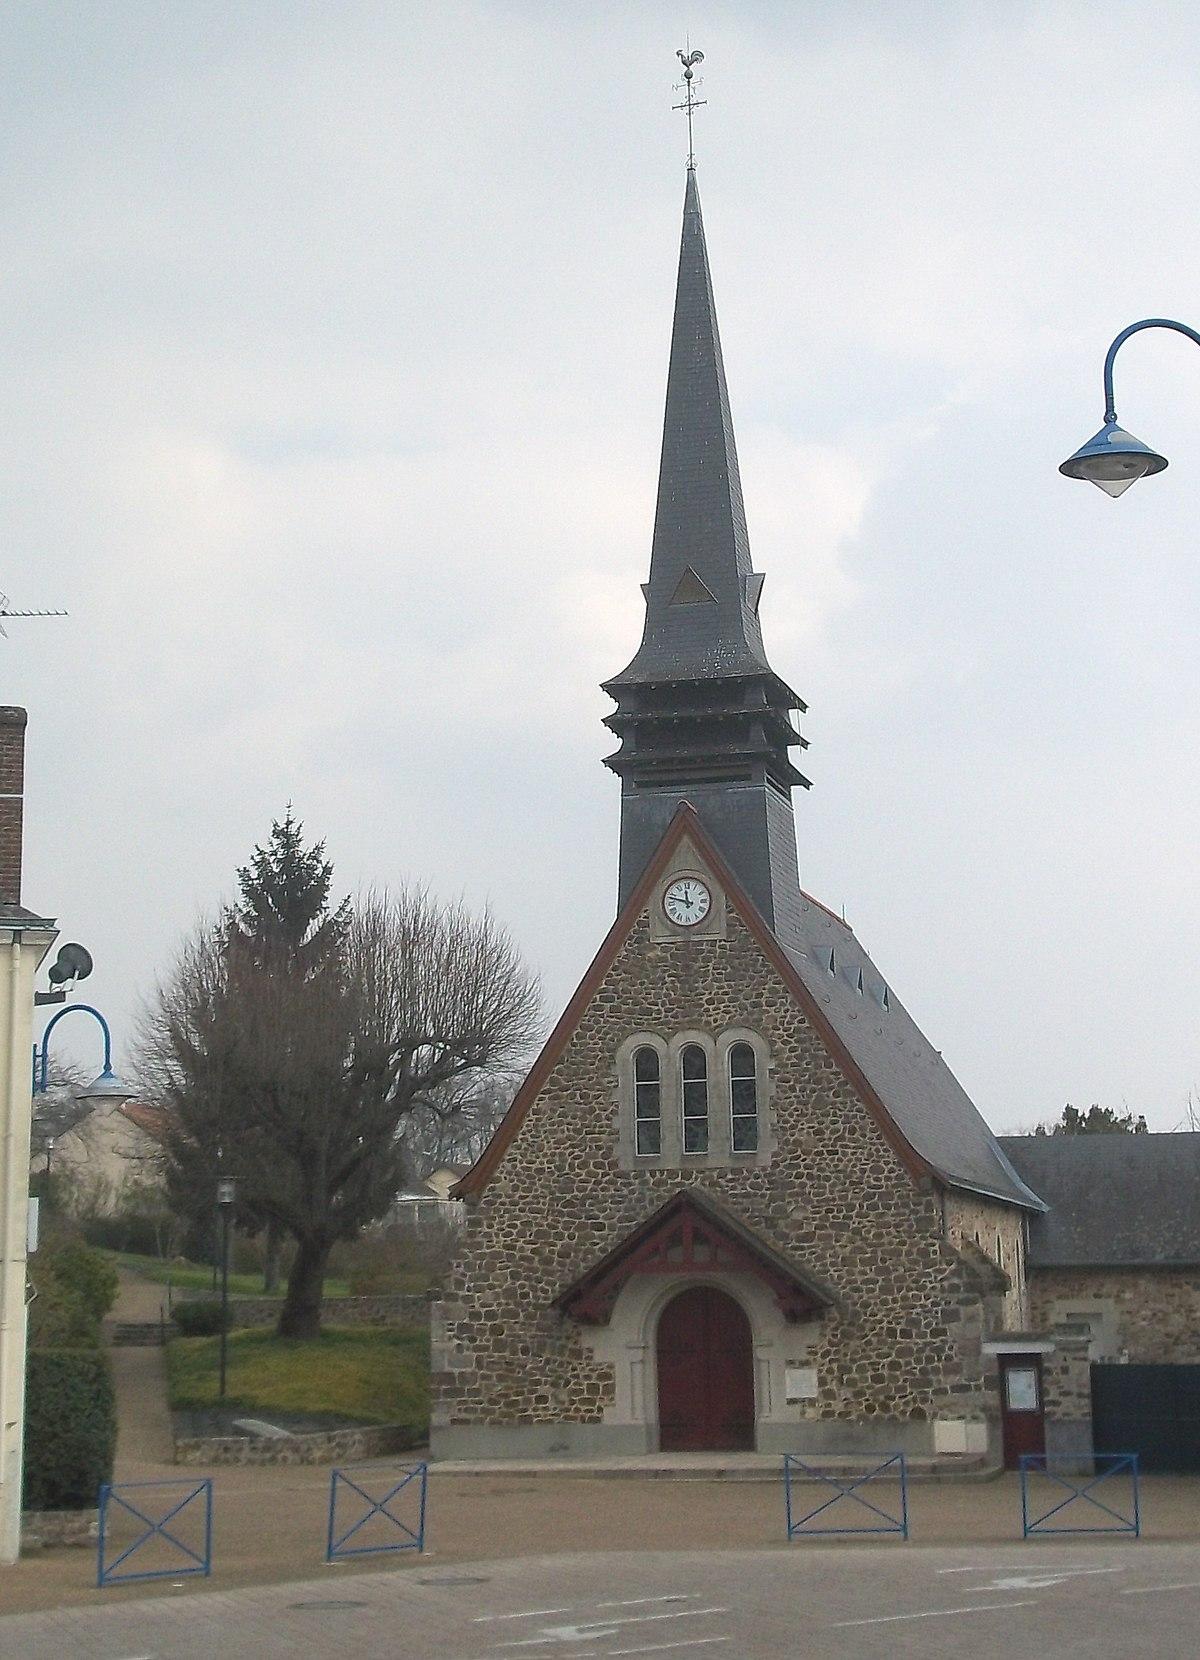 La chapelle saint aubin wikip dia - La petite cheminee saint aubin ...